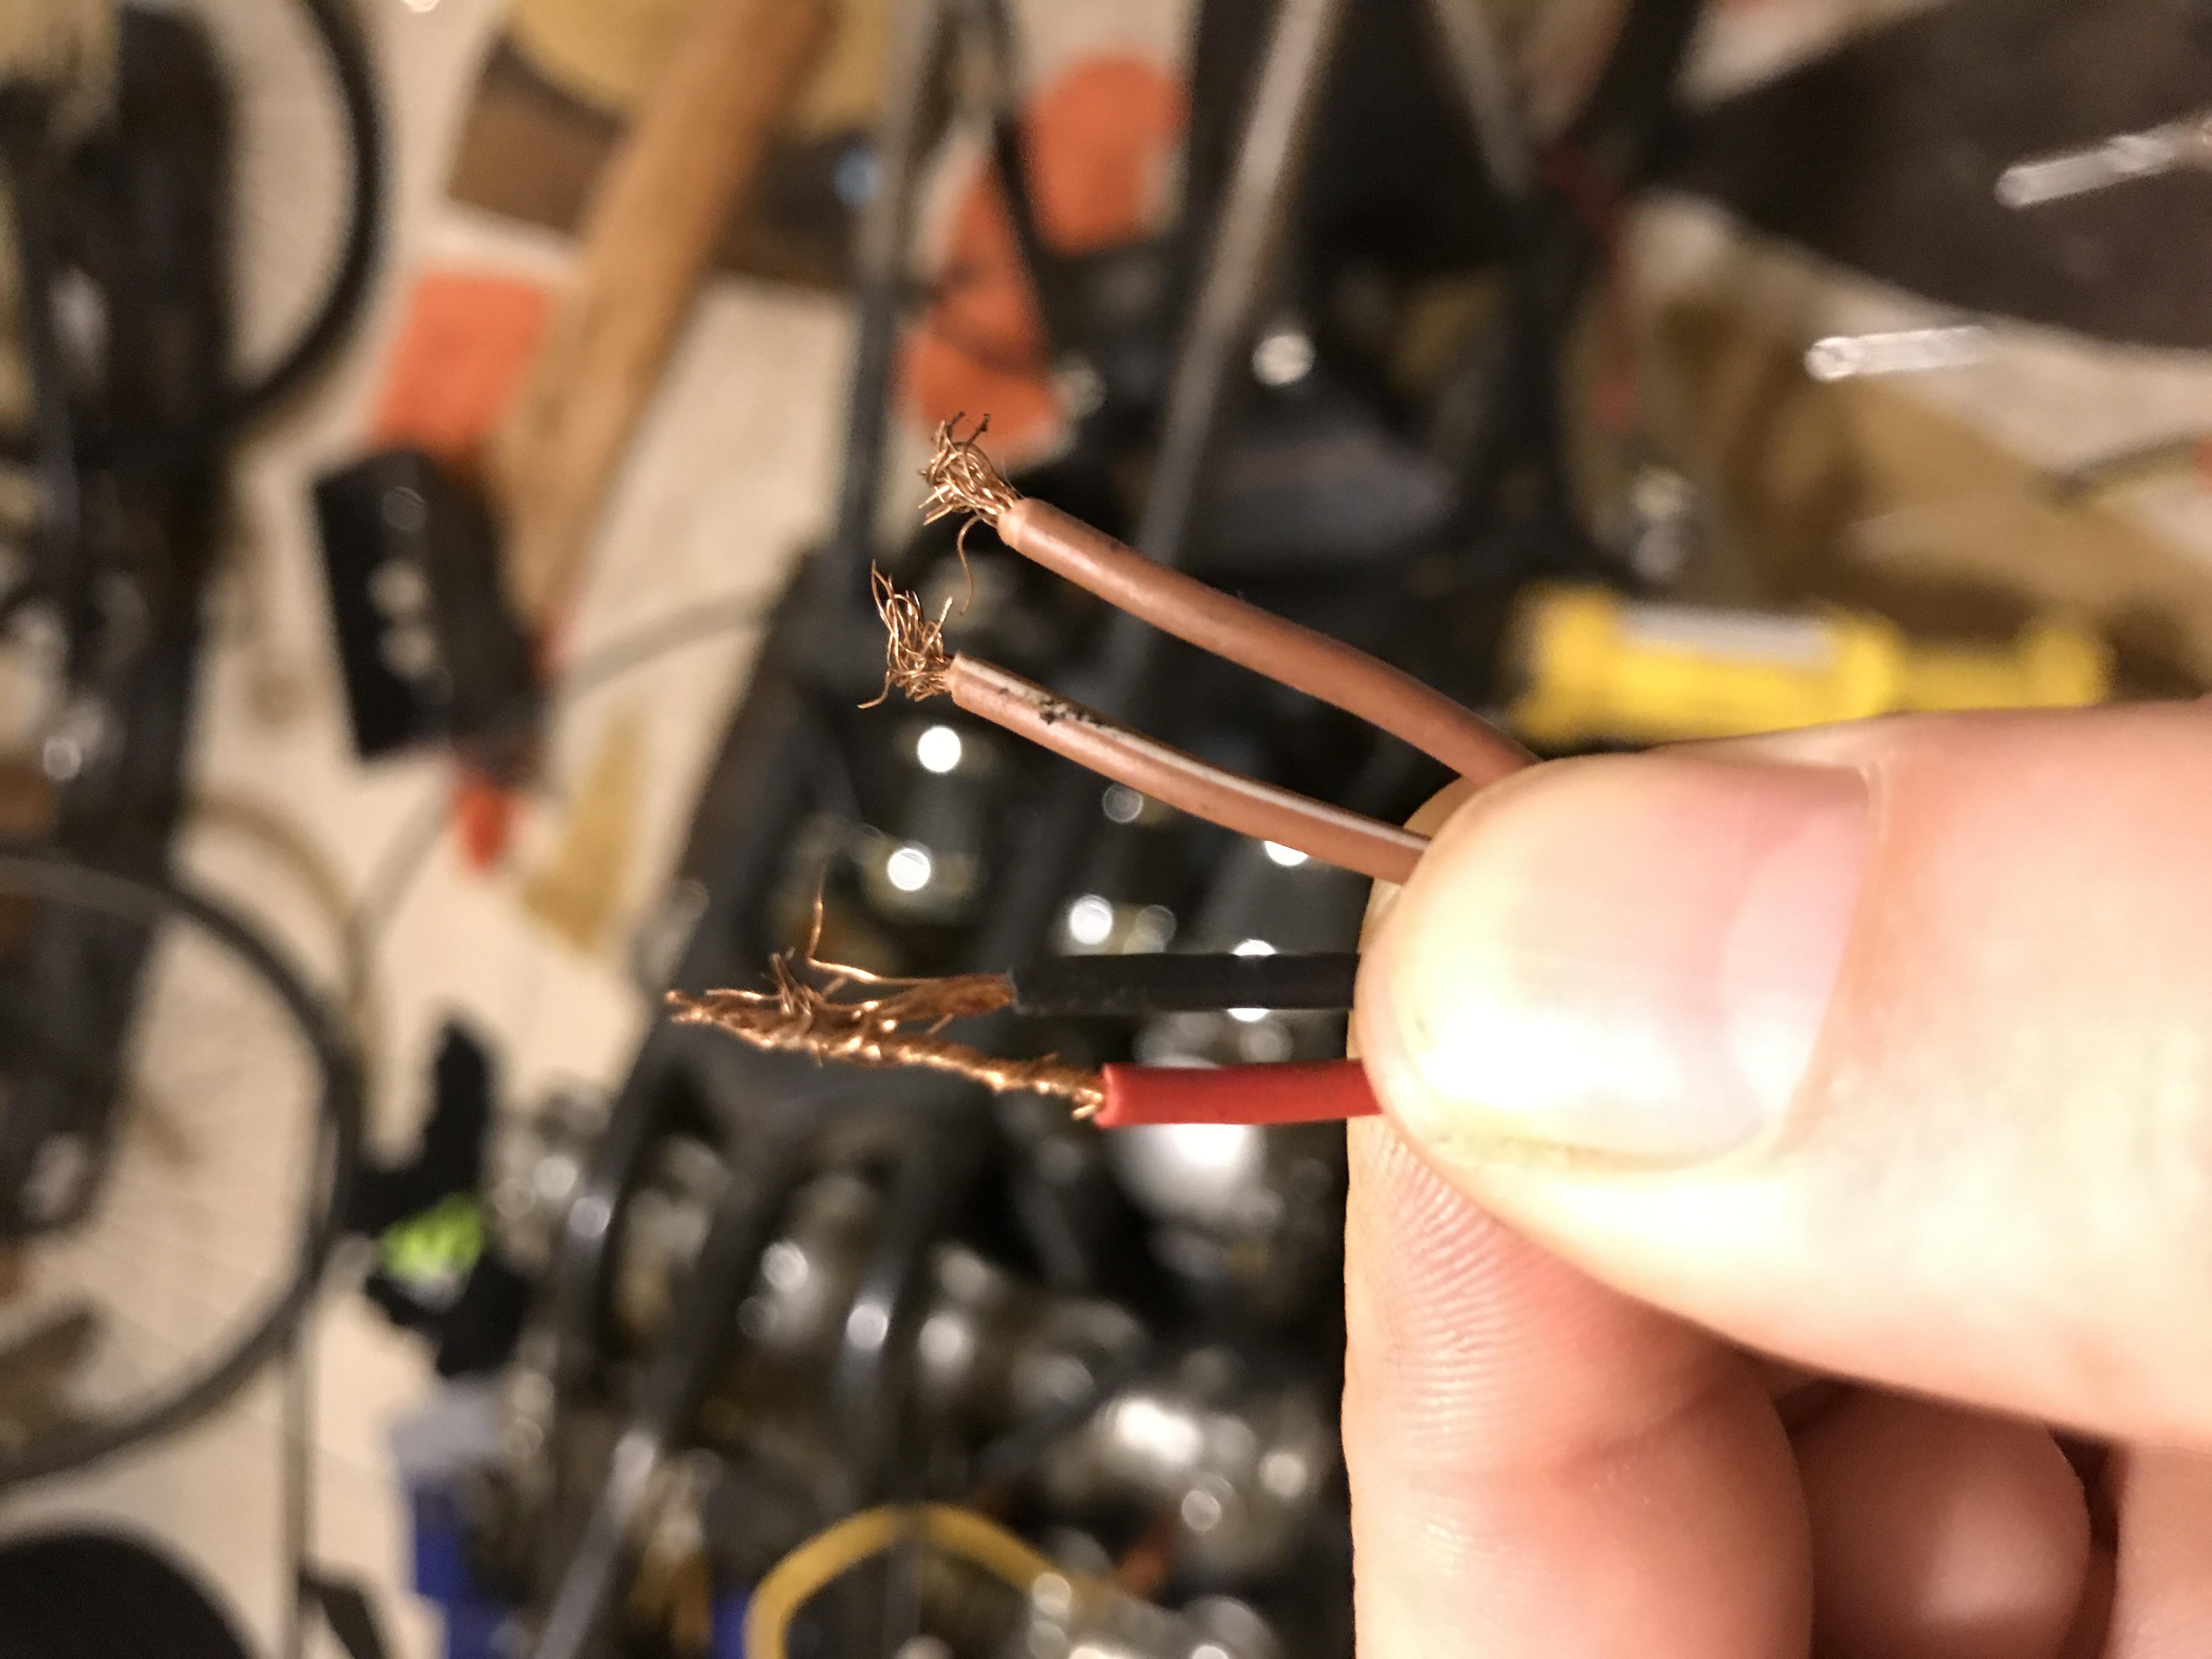 1982 CB750 Ignition / Solenoid wiring HELP